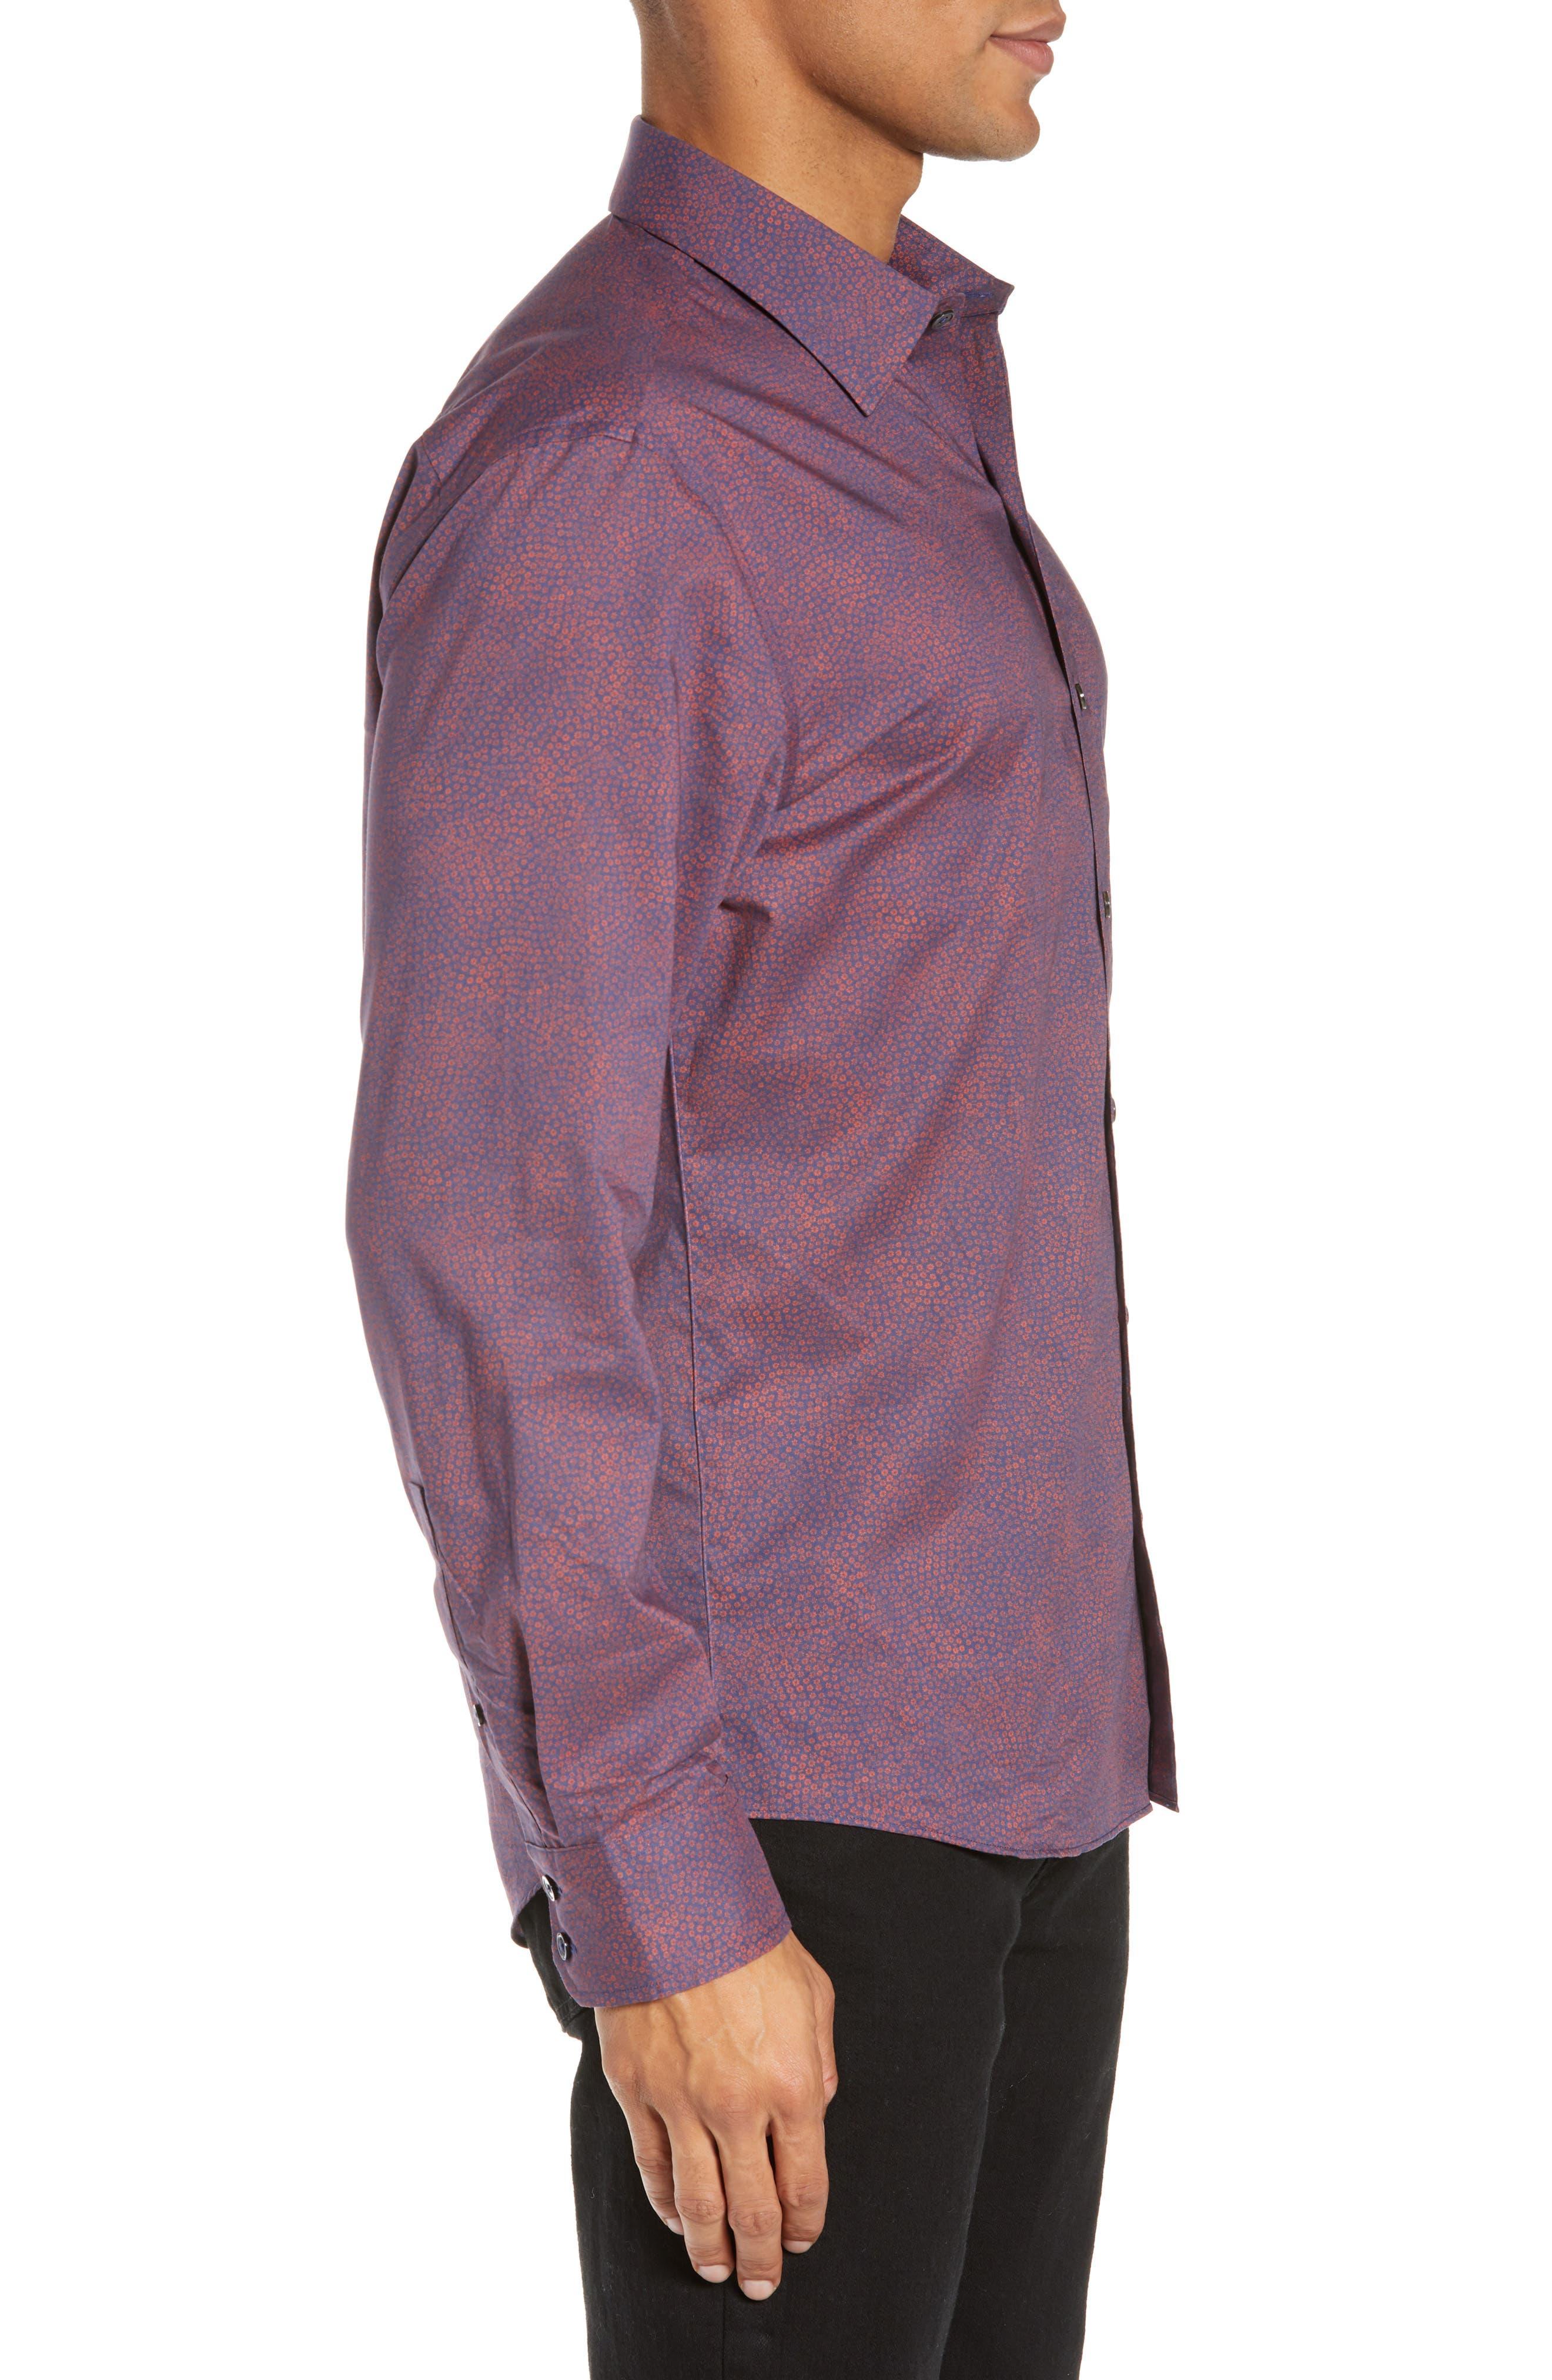 ZACHARY PRELL, Maryna Regular Fit Floral Print Sport Shirt, Alternate thumbnail 4, color, ORANGE